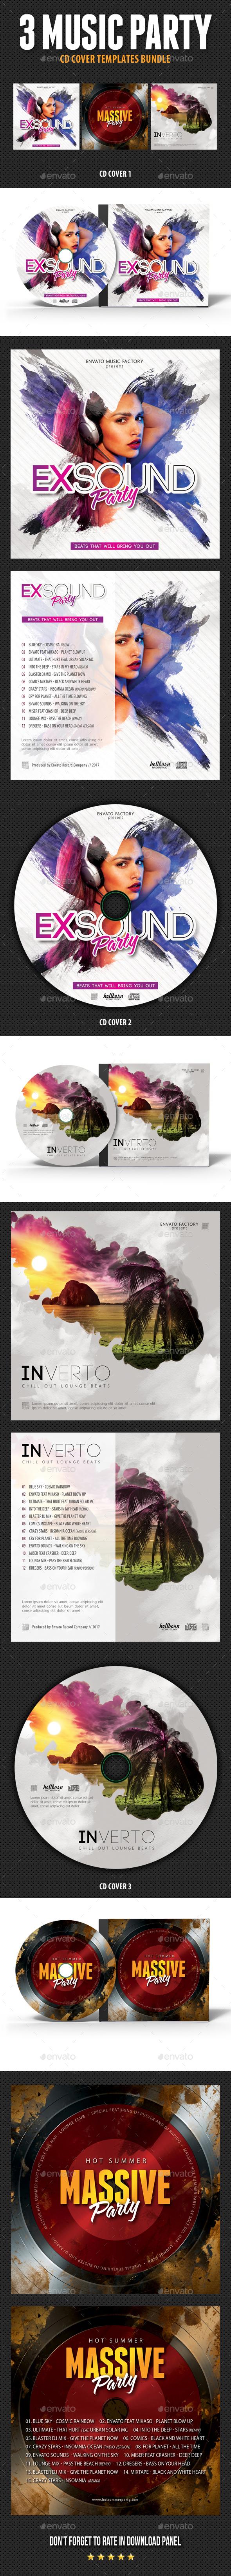 3 Music Party CD Cover Bundle V1 - CD & DVD Artwork Print Templates